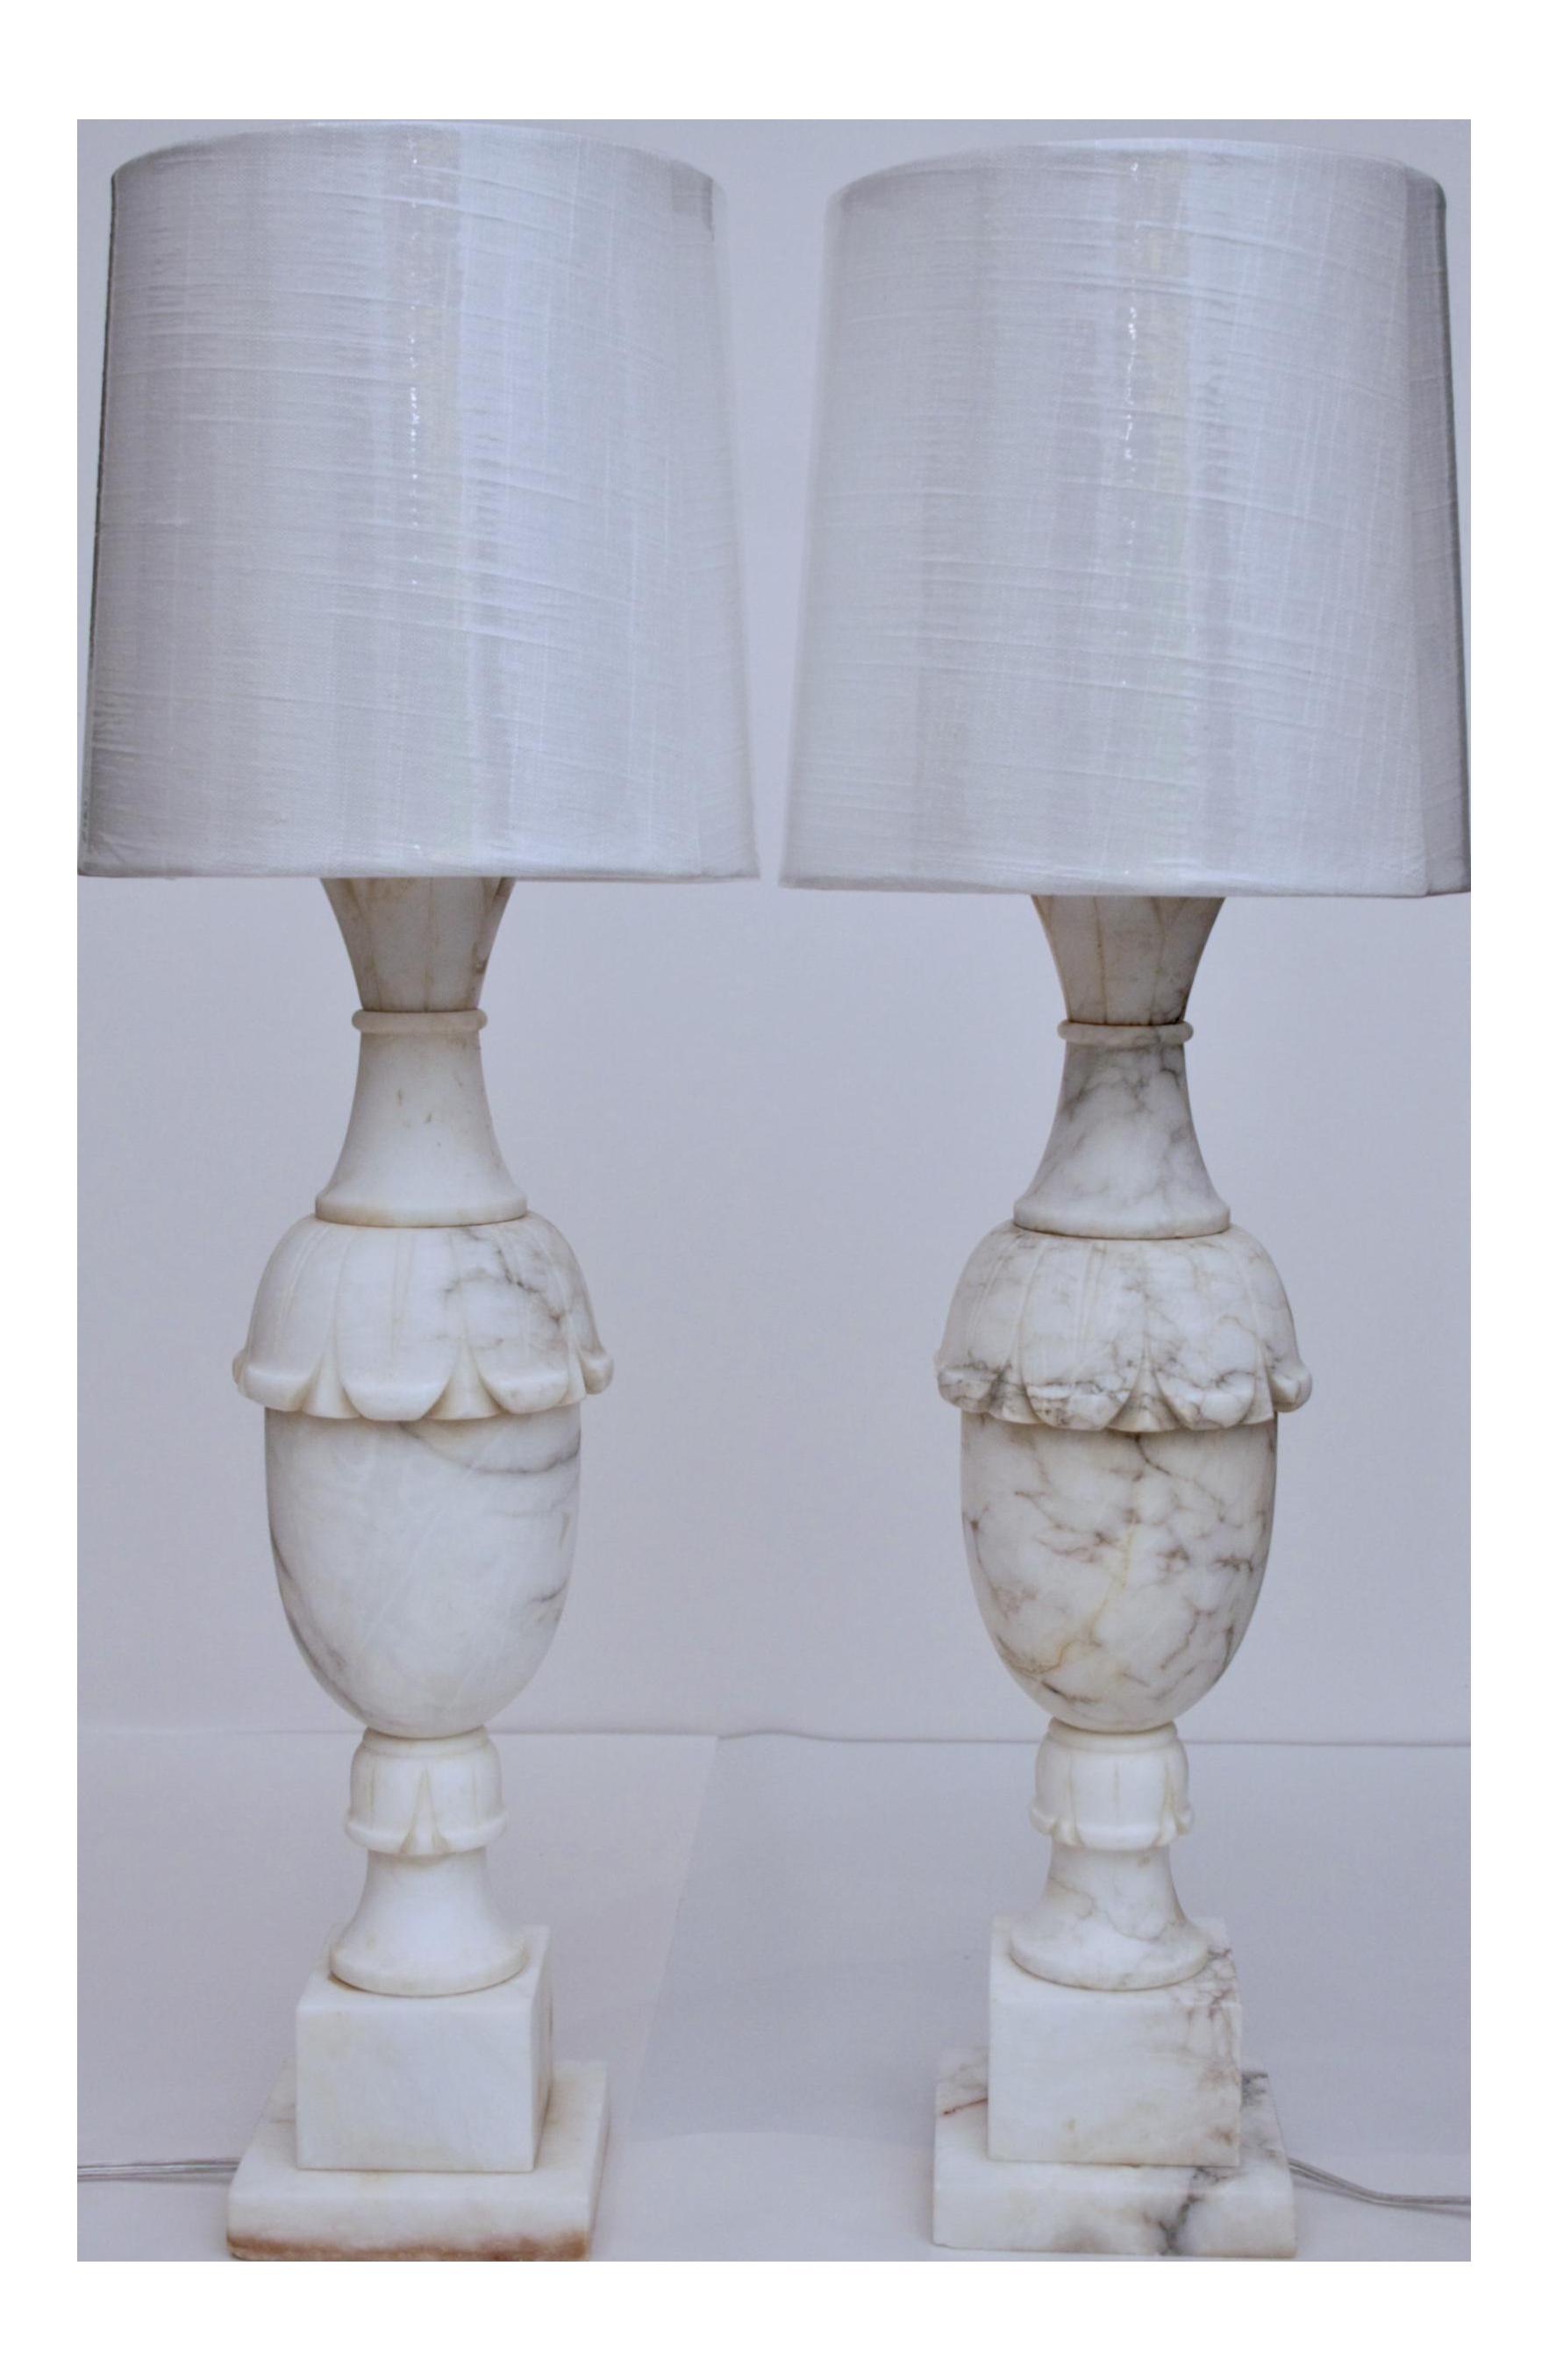 marble base lamp vintage desafiocincodias colorful